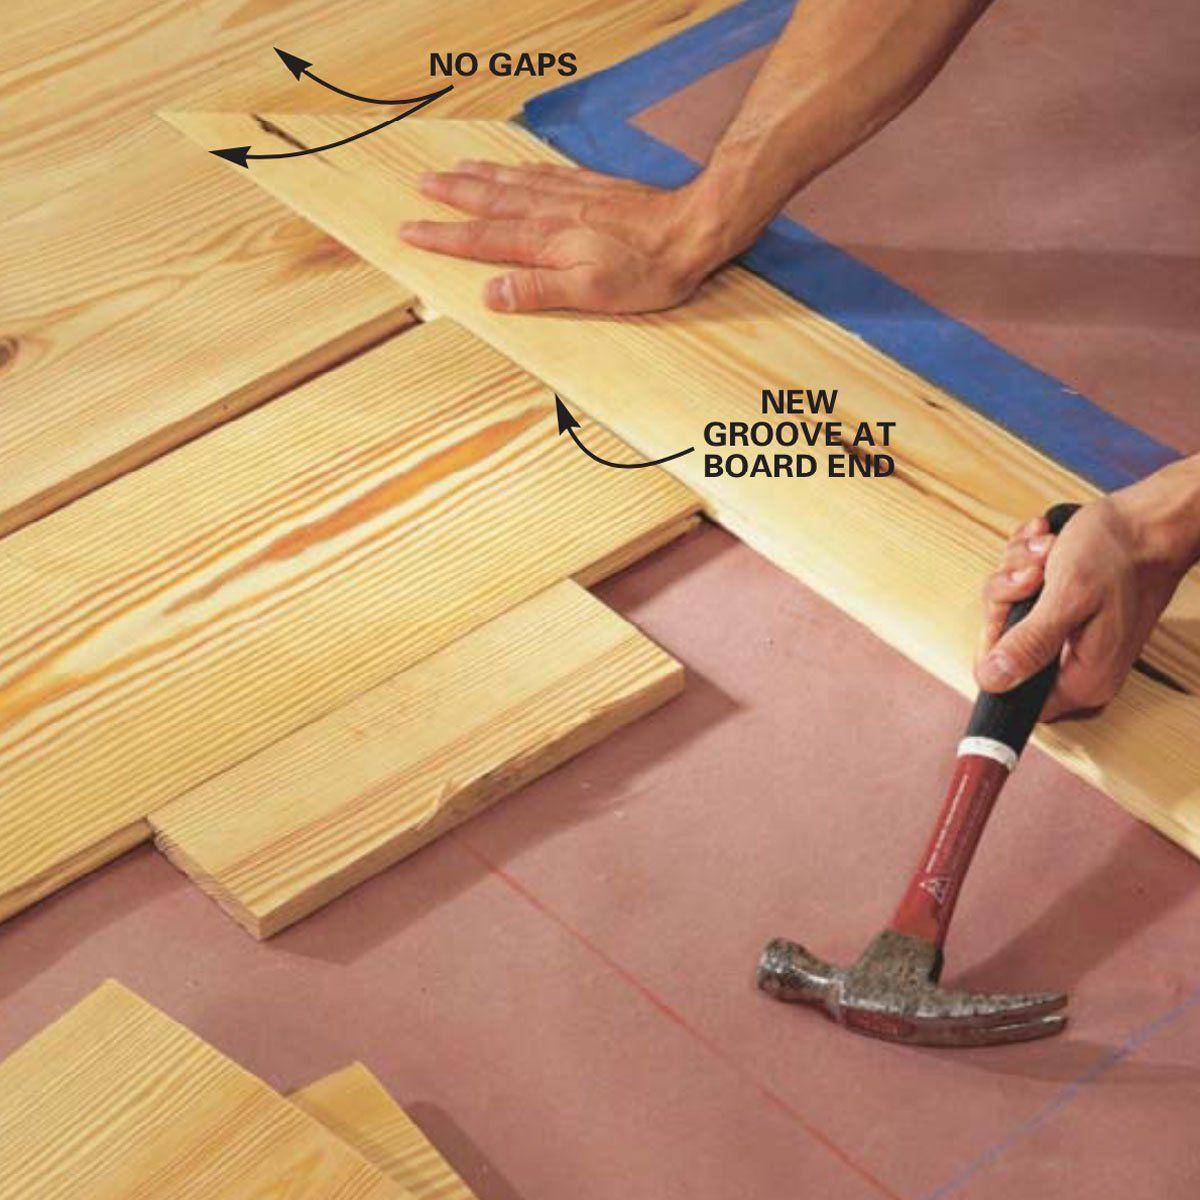 How to Install Pine Floors Pine floors, Diy wood floors